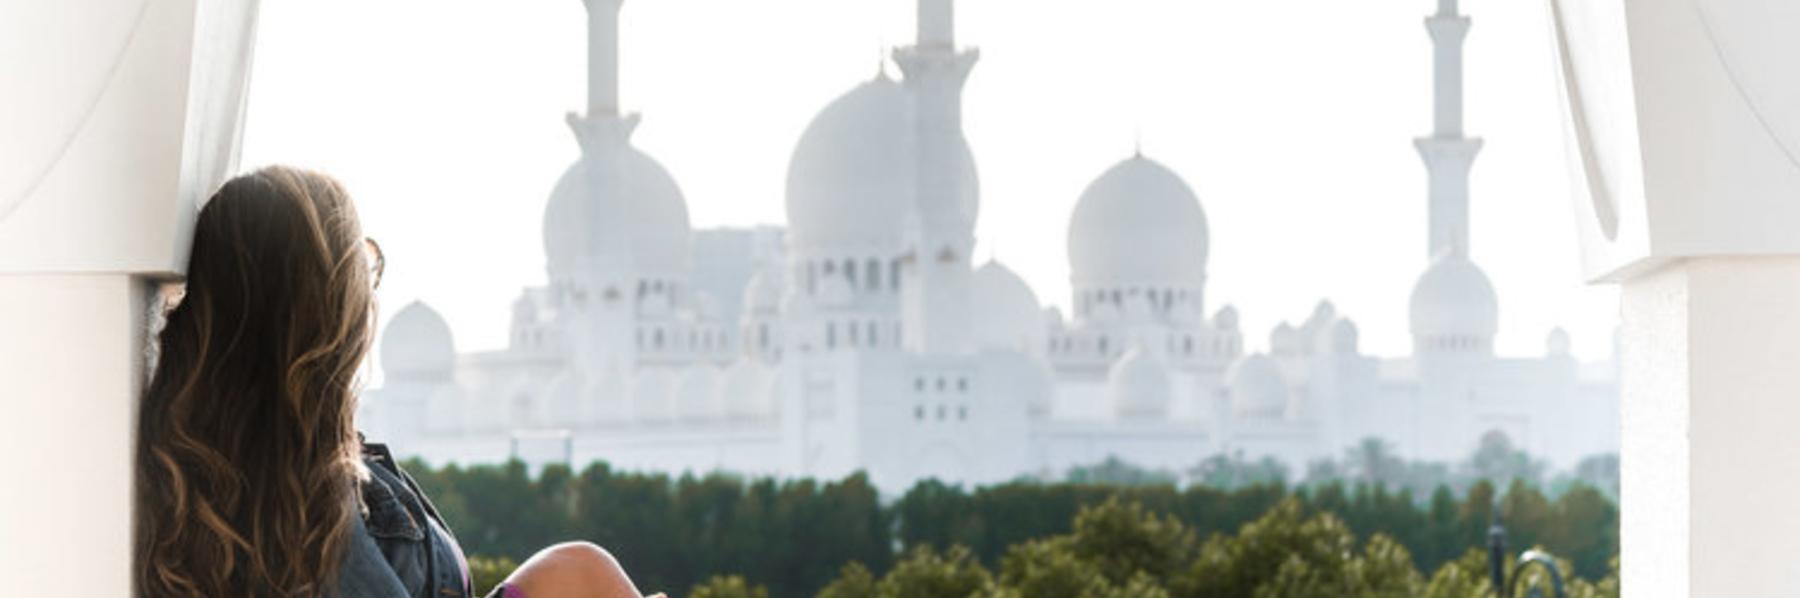 The Ritz Carlton Abu Dhabi from Dublin